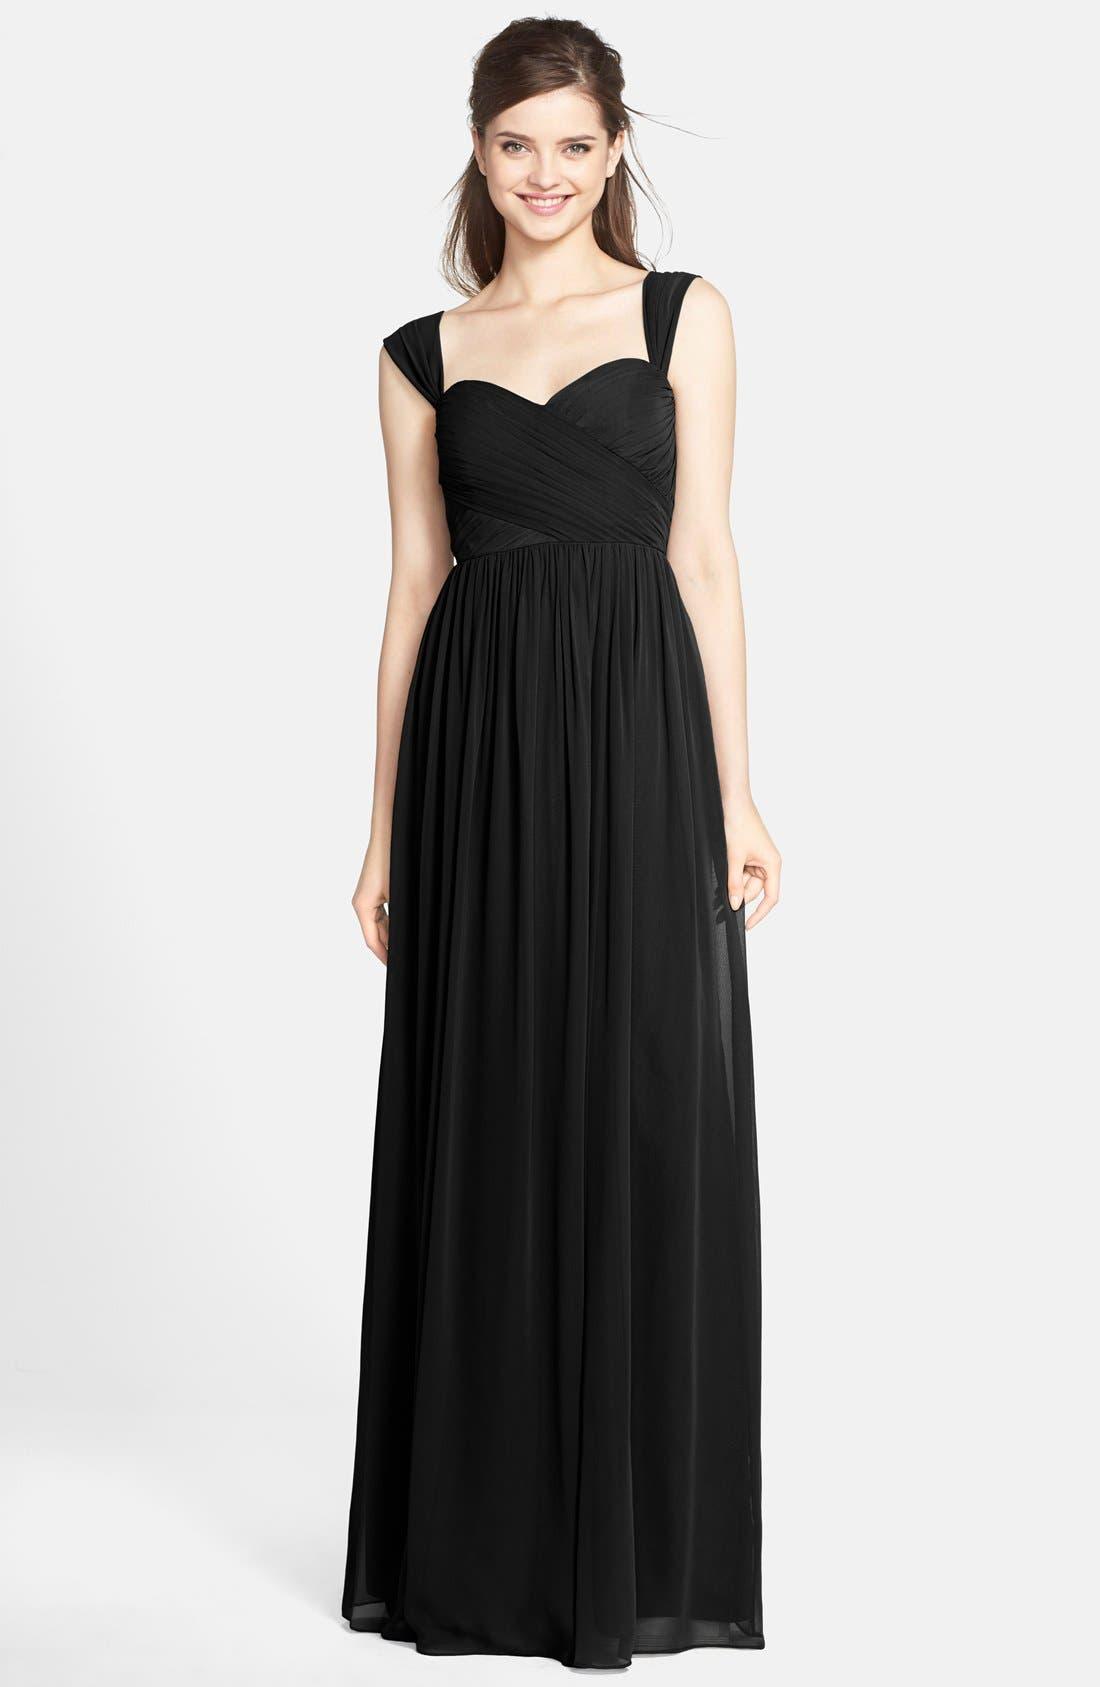 Main Image - Jenny Yoo 'Leah' Convertible Chiffon Gown